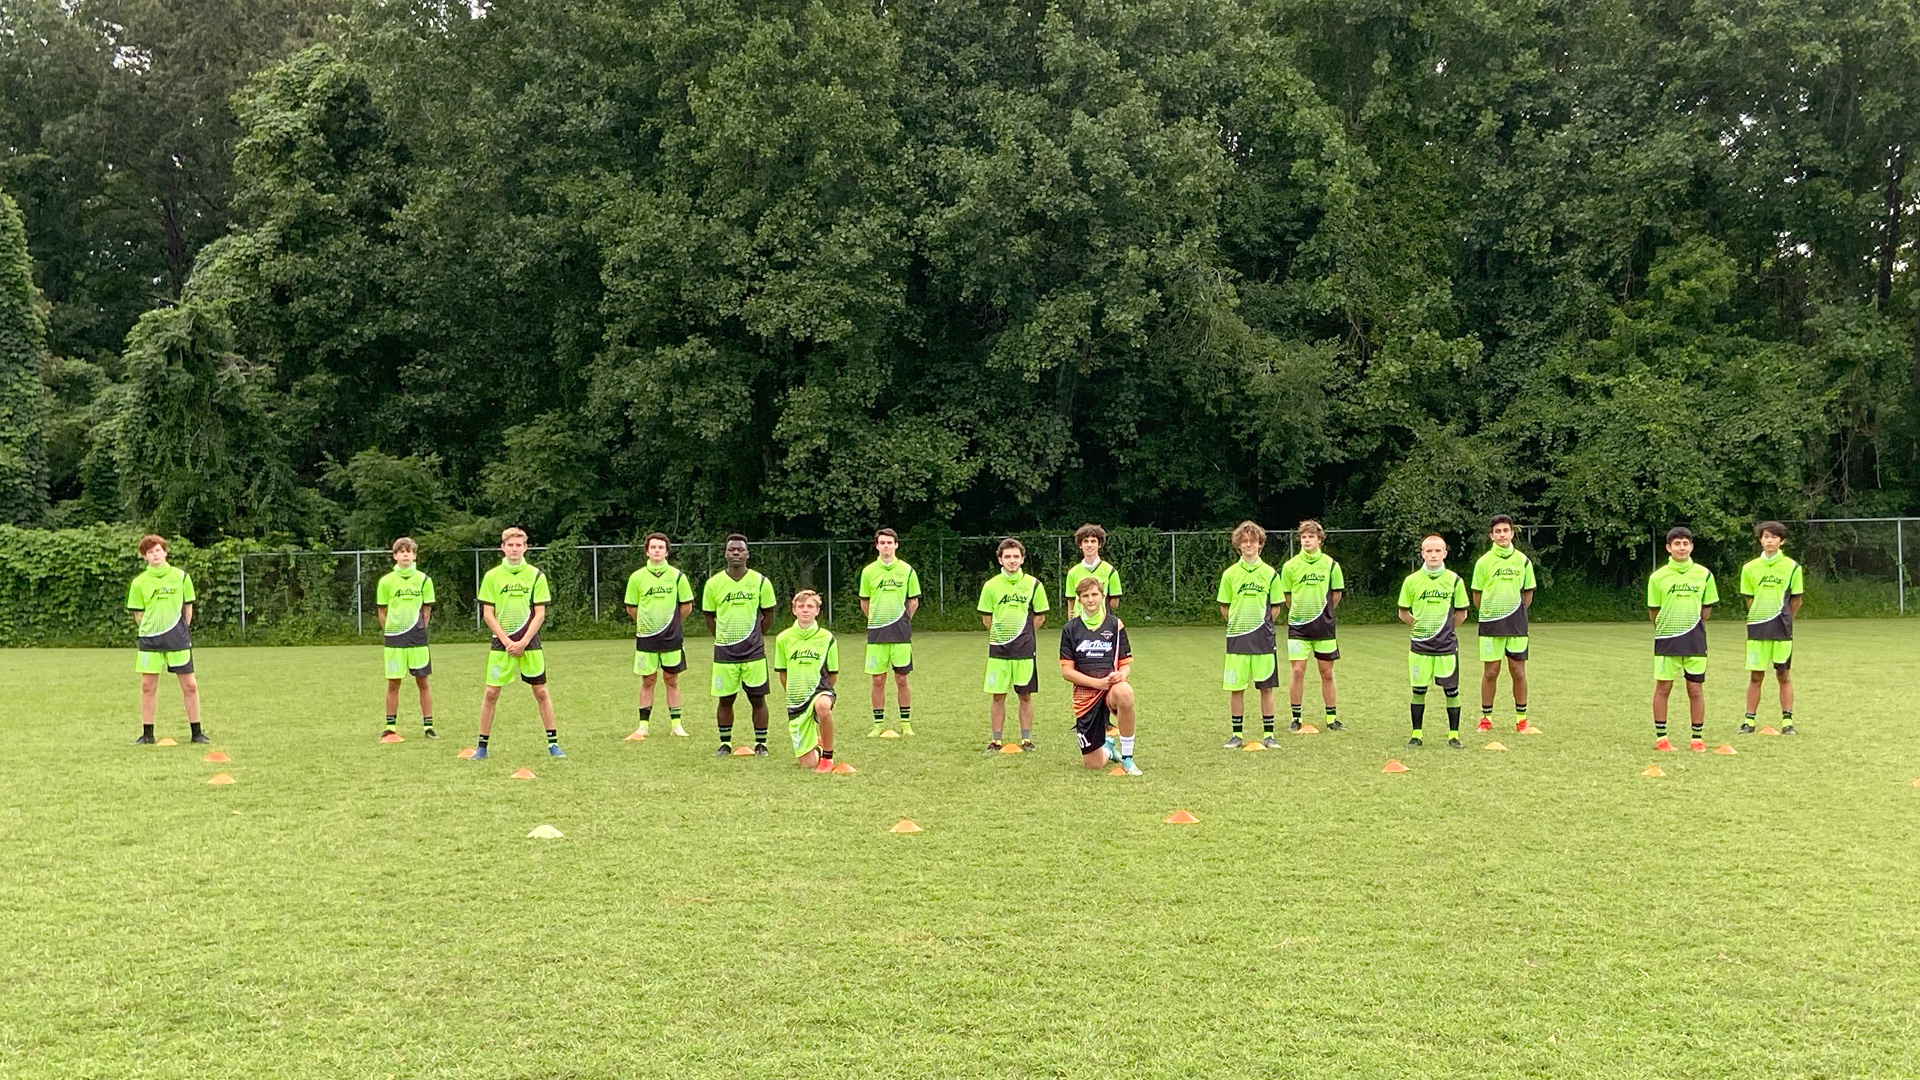 CVILLE UNITED | Youth Soccer Club | Charlottesville, Virginia | U17 Boys Soccer Team Photo